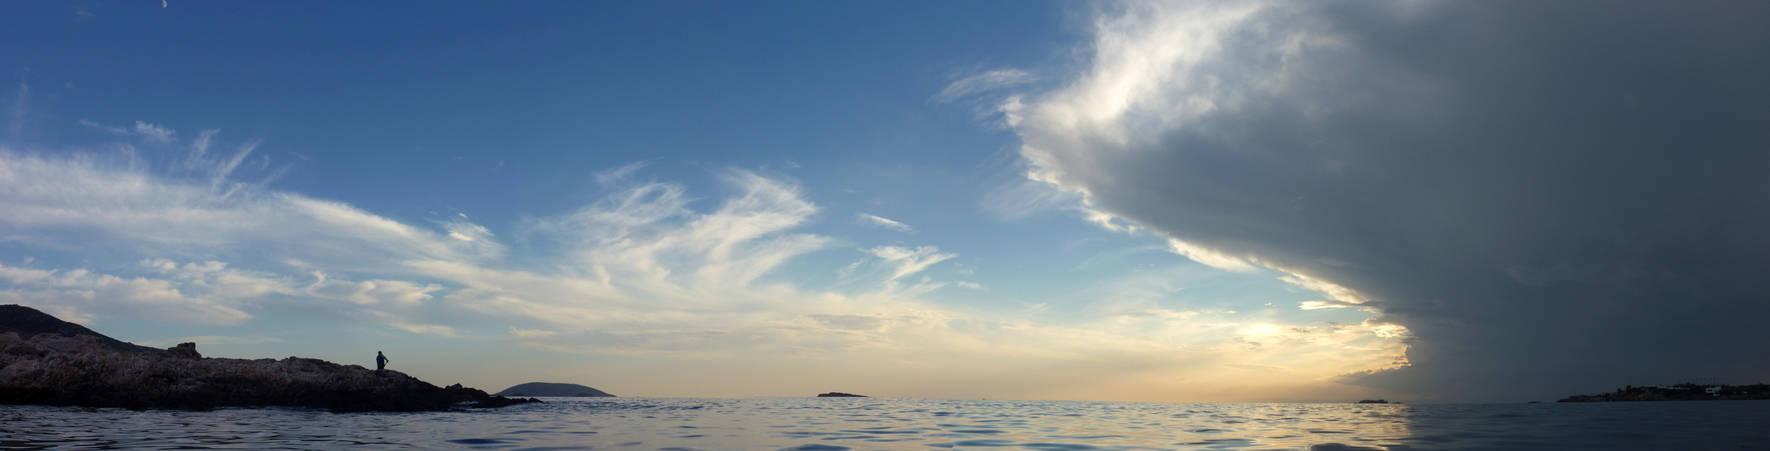 Panorama01-October15,LagonisiB